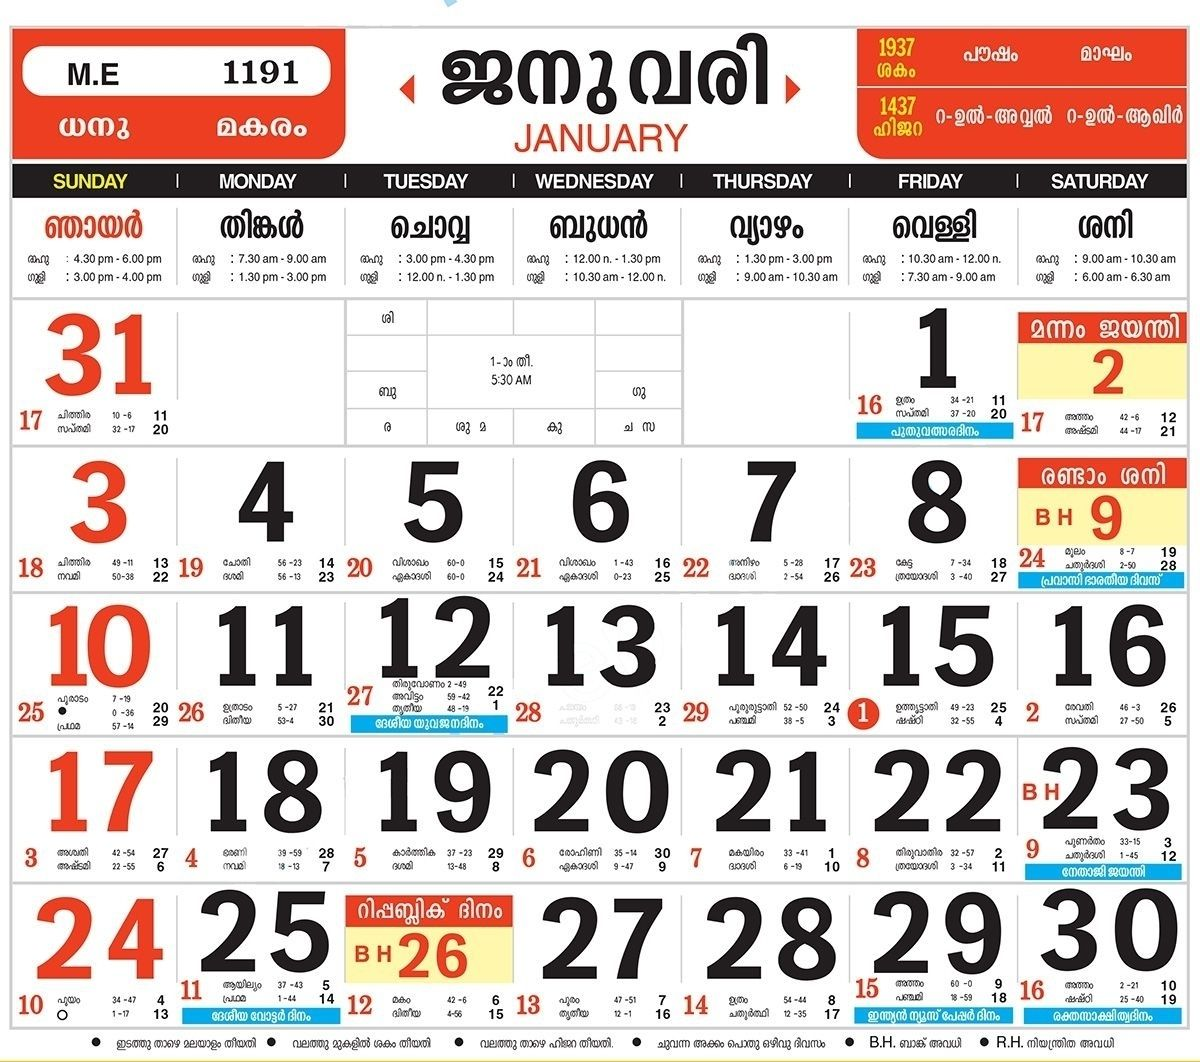 Malayalam Calendar 2022.2019 January Calendar Malayalam Galokombi Free Malayalam Calendar January Calendar February Calendar